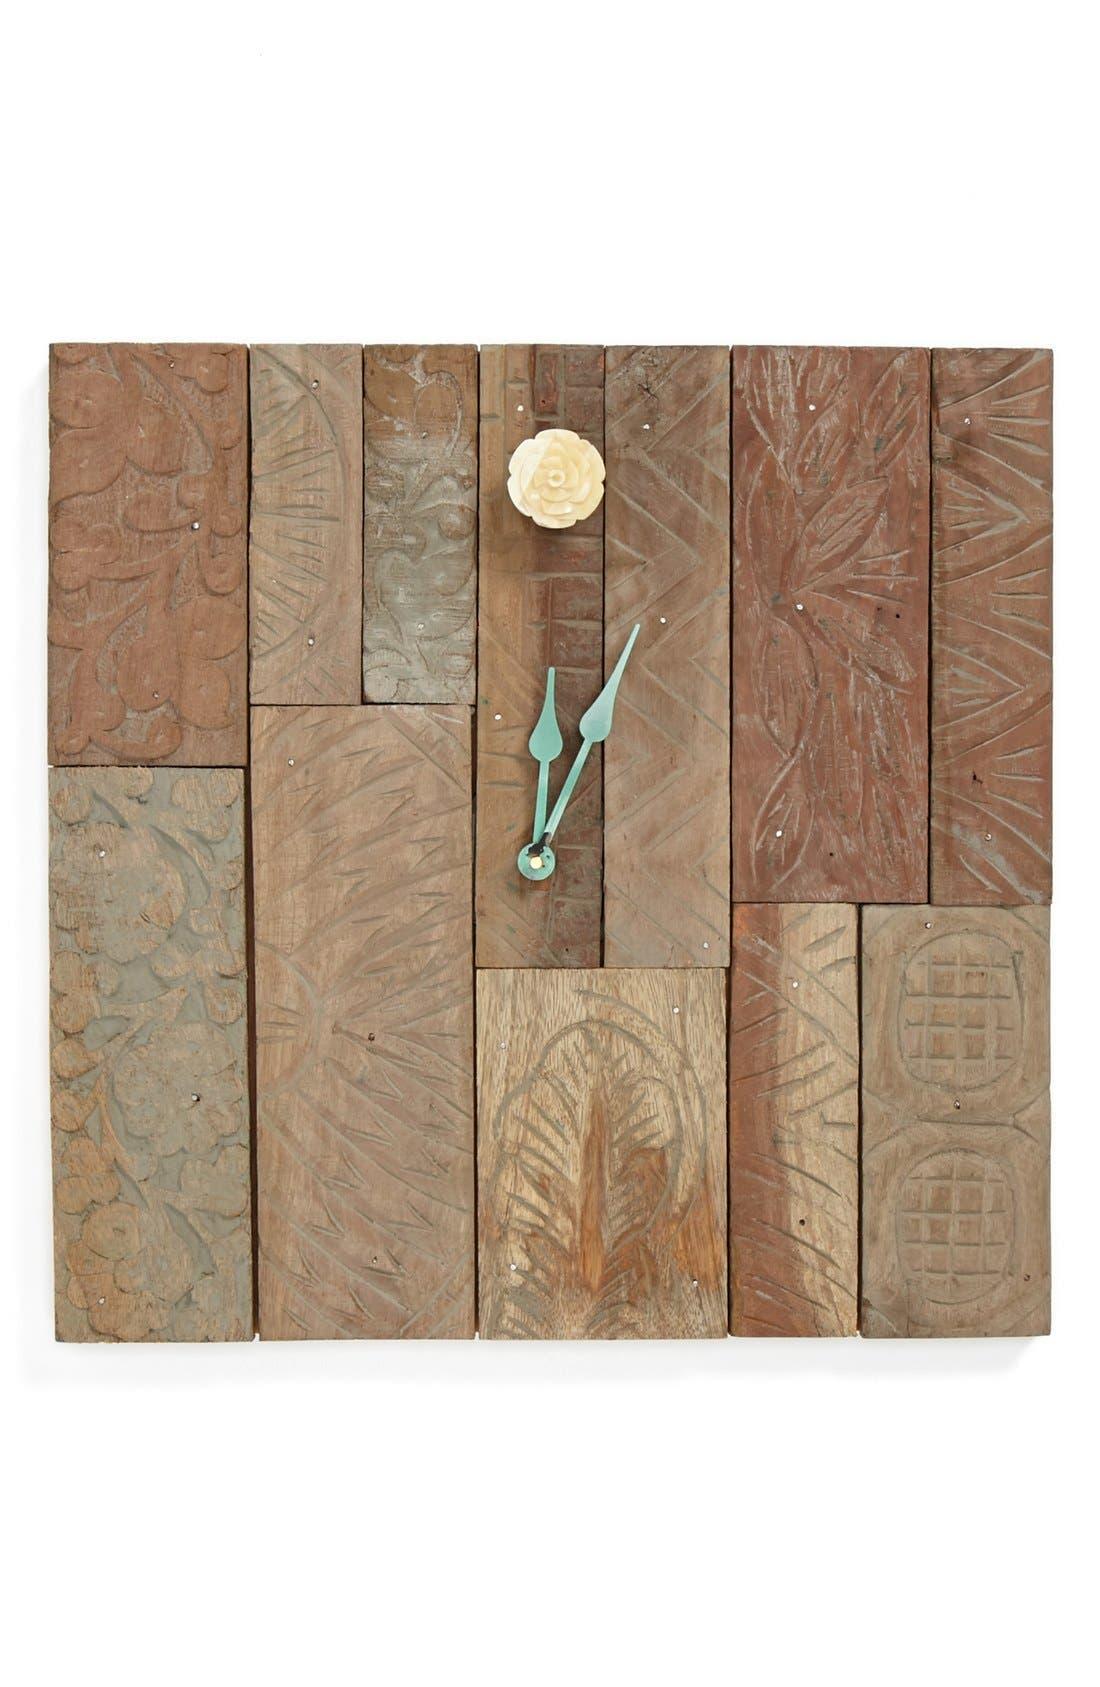 Alternate Image 1 Selected - Foreside 'Collectors Corner' Block Wall Clock